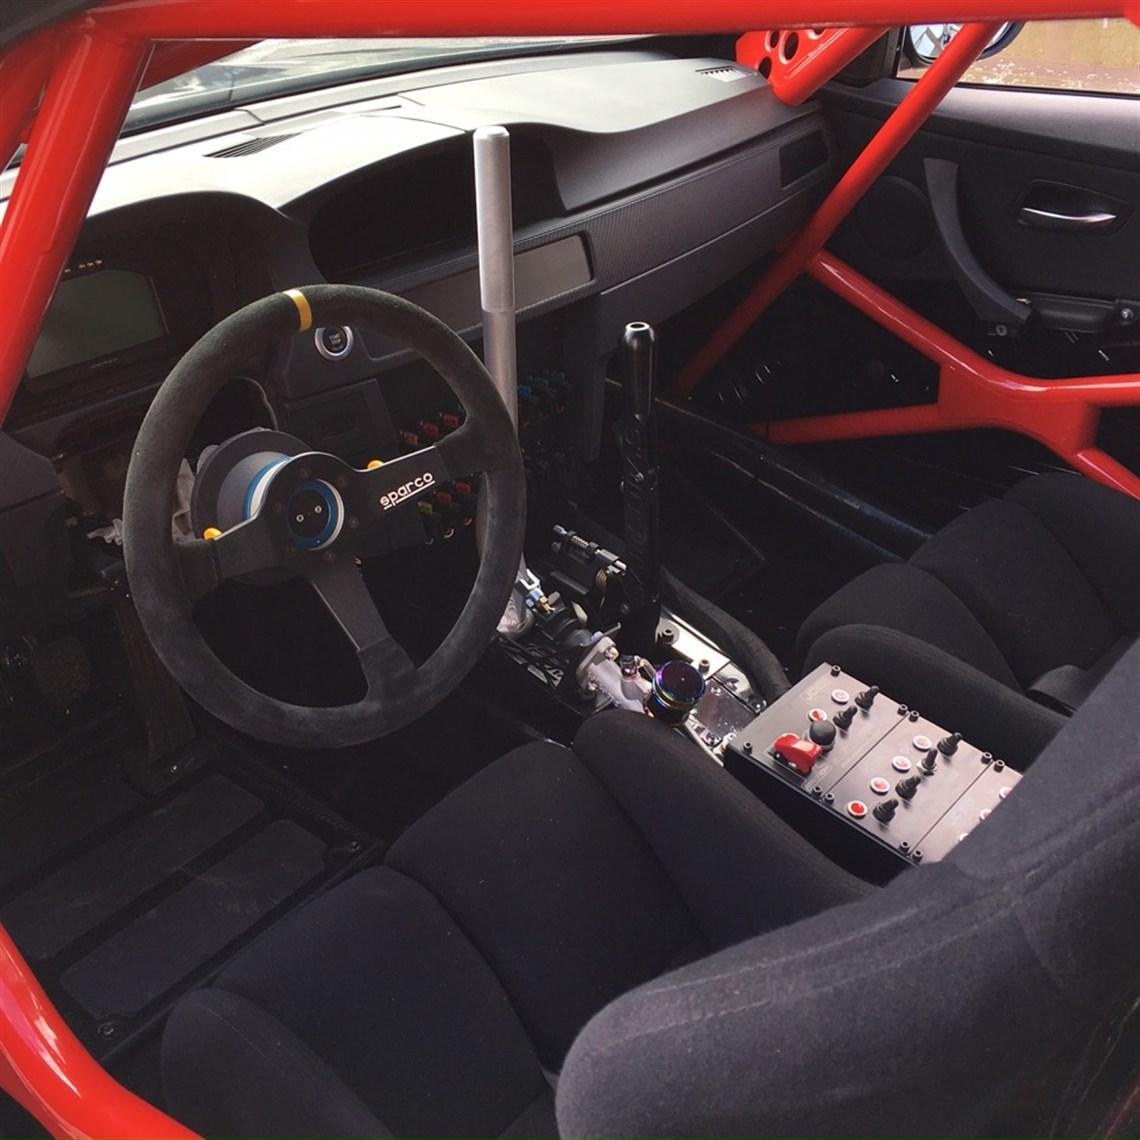 Bmw M3 Vortech Supercharger: BMW M3 E92 Liberty Walk, V8 Supercharged